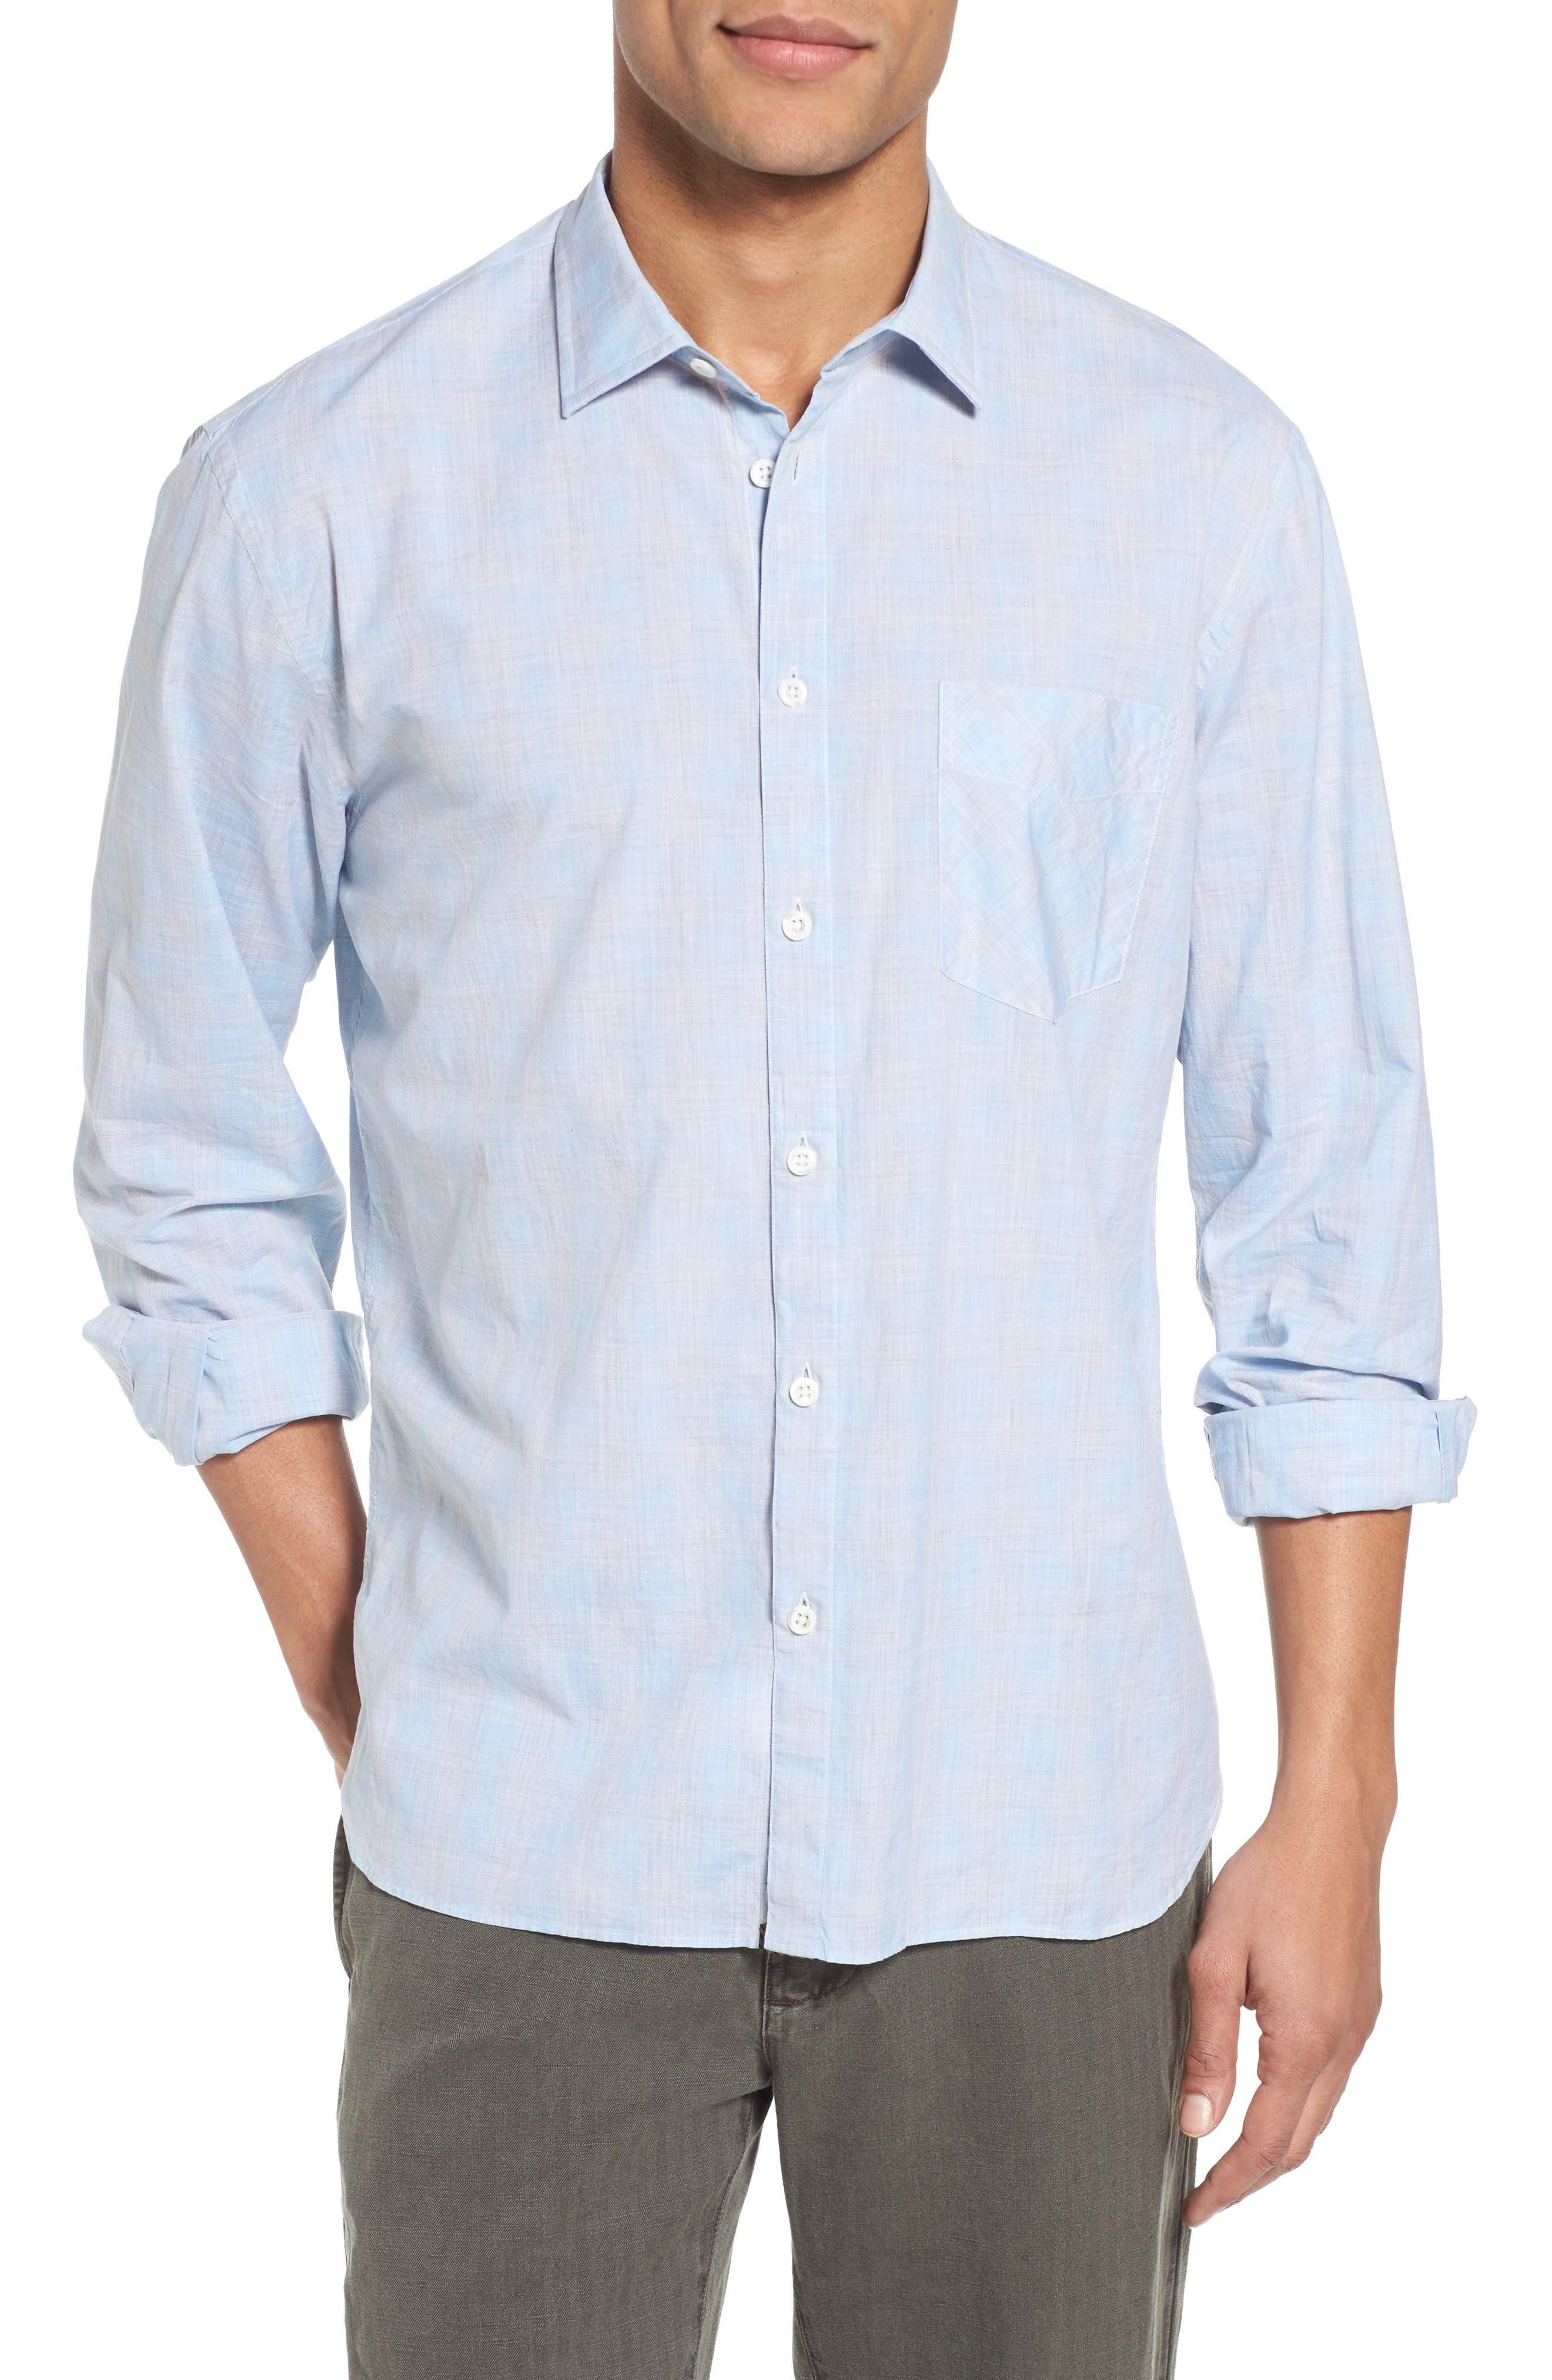 John T Slim Fit Sport Shirt,                         Main,                         color, Light Blue